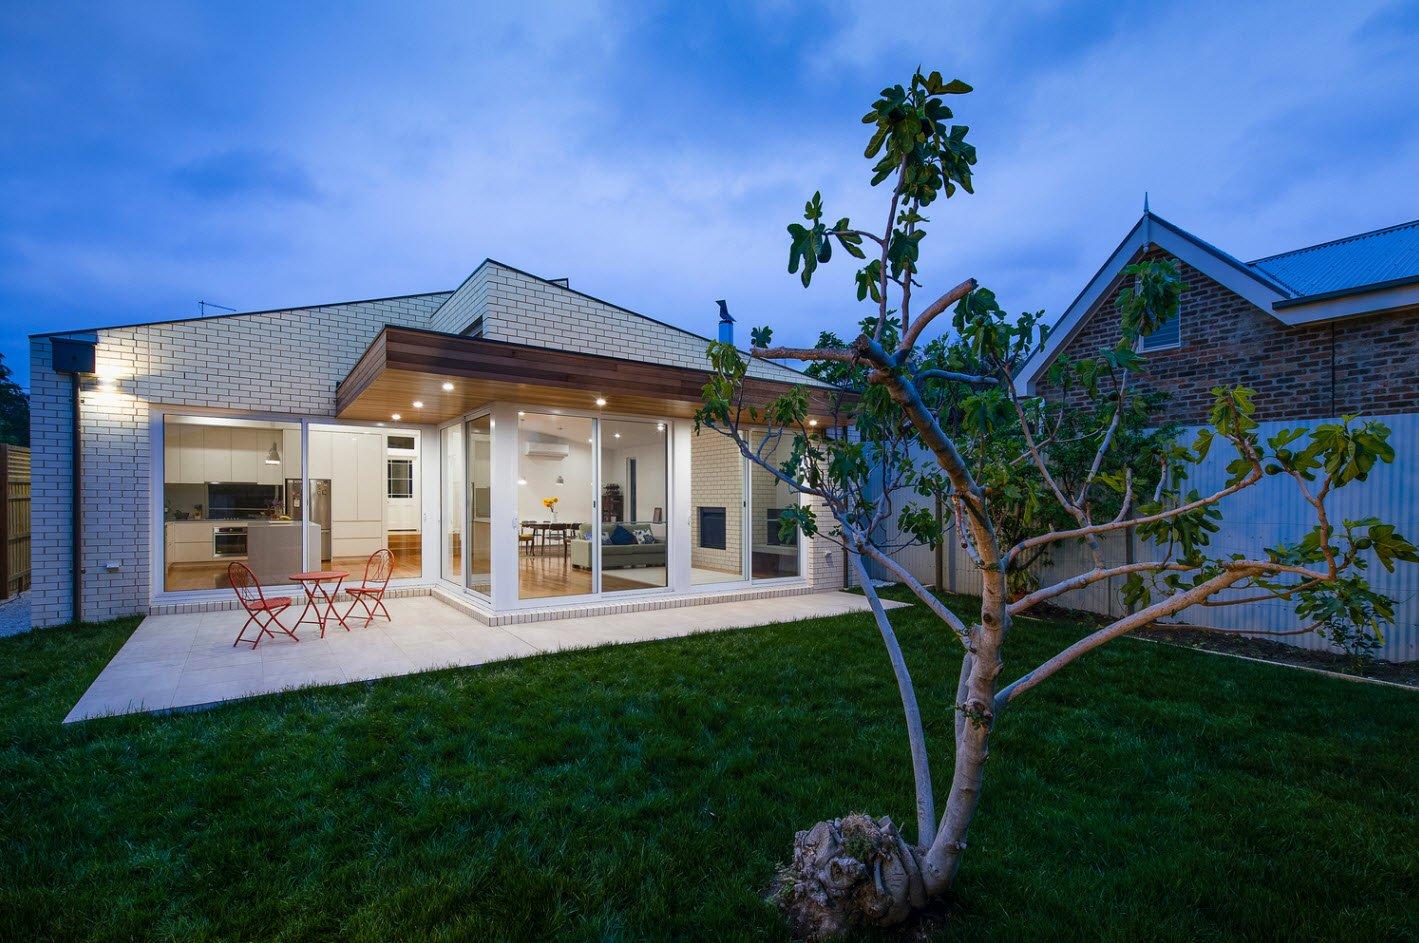 Vista de fachada – Diseño: ITN Architects   Fotos: Patrick Rodriguez